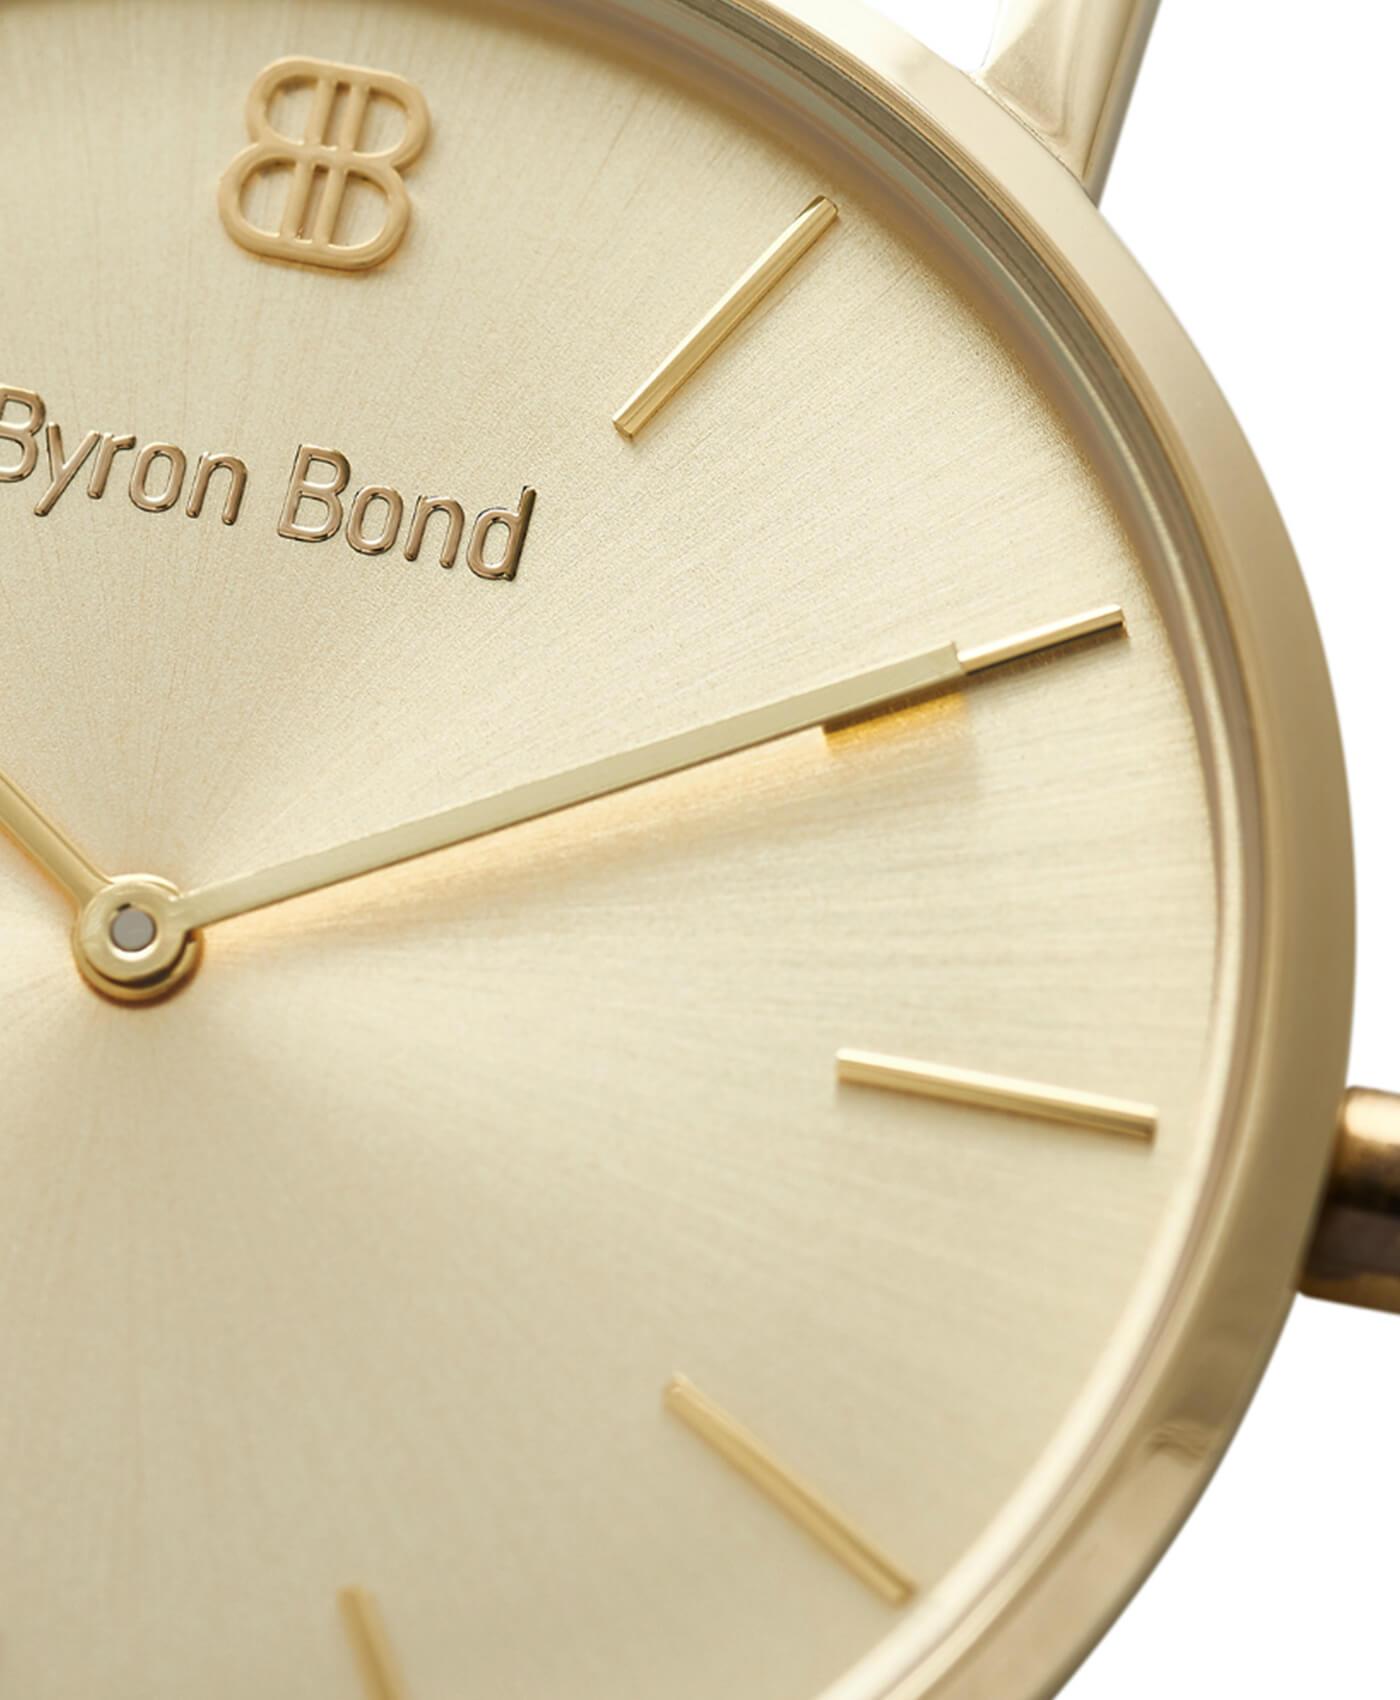 Byron Bond - Regent - 38mm